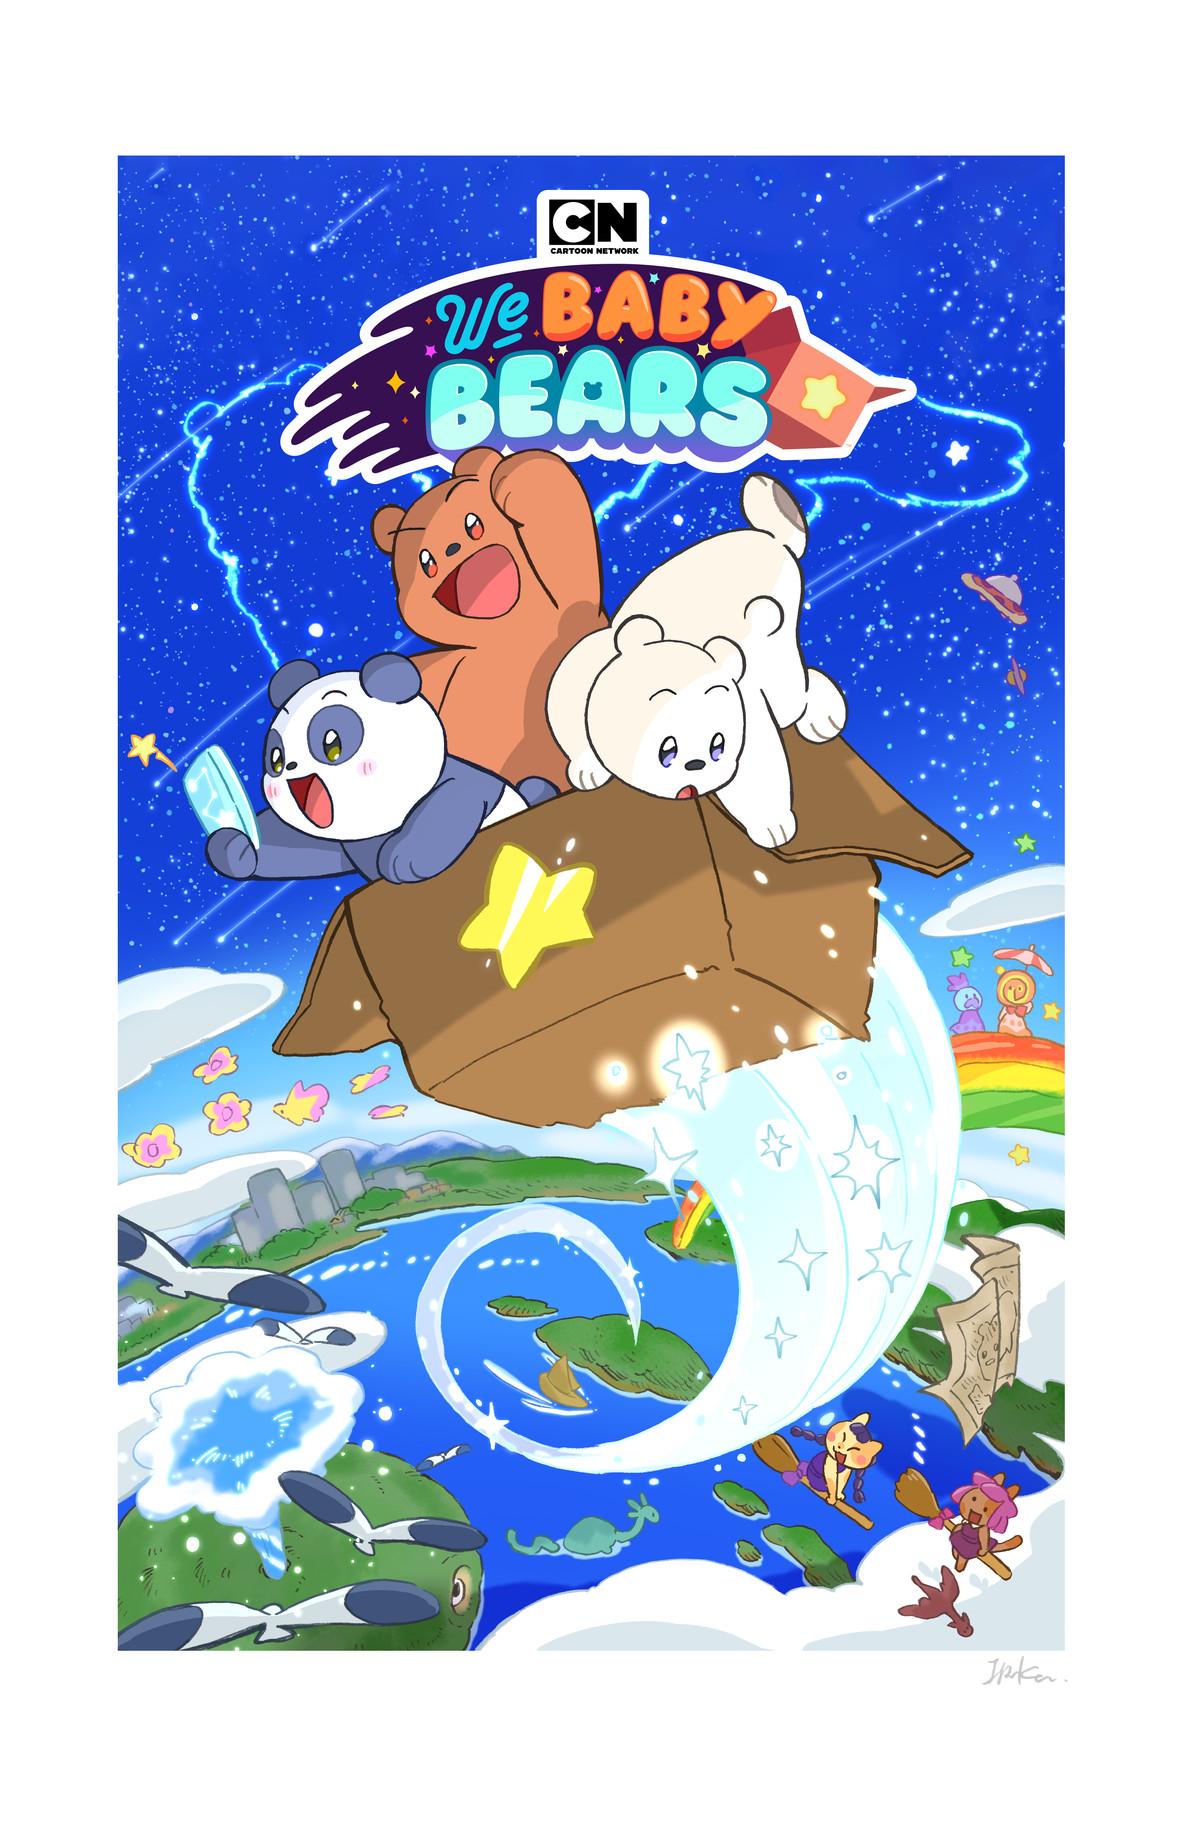 the bare bears as baby bears